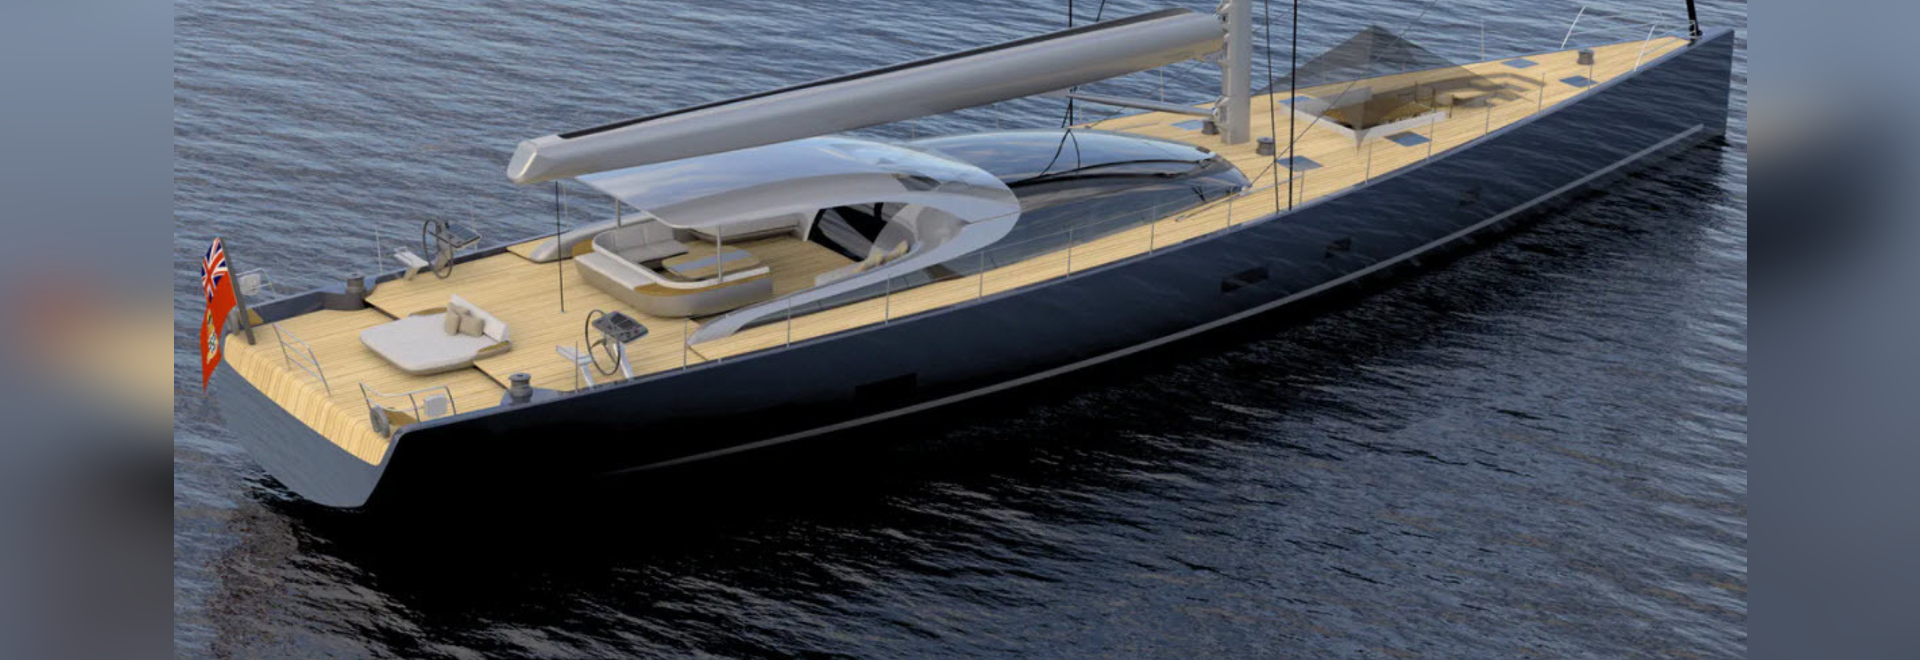 Malcolm McKeon Yacht Design Reveals Sailing Yacht Concept MM38